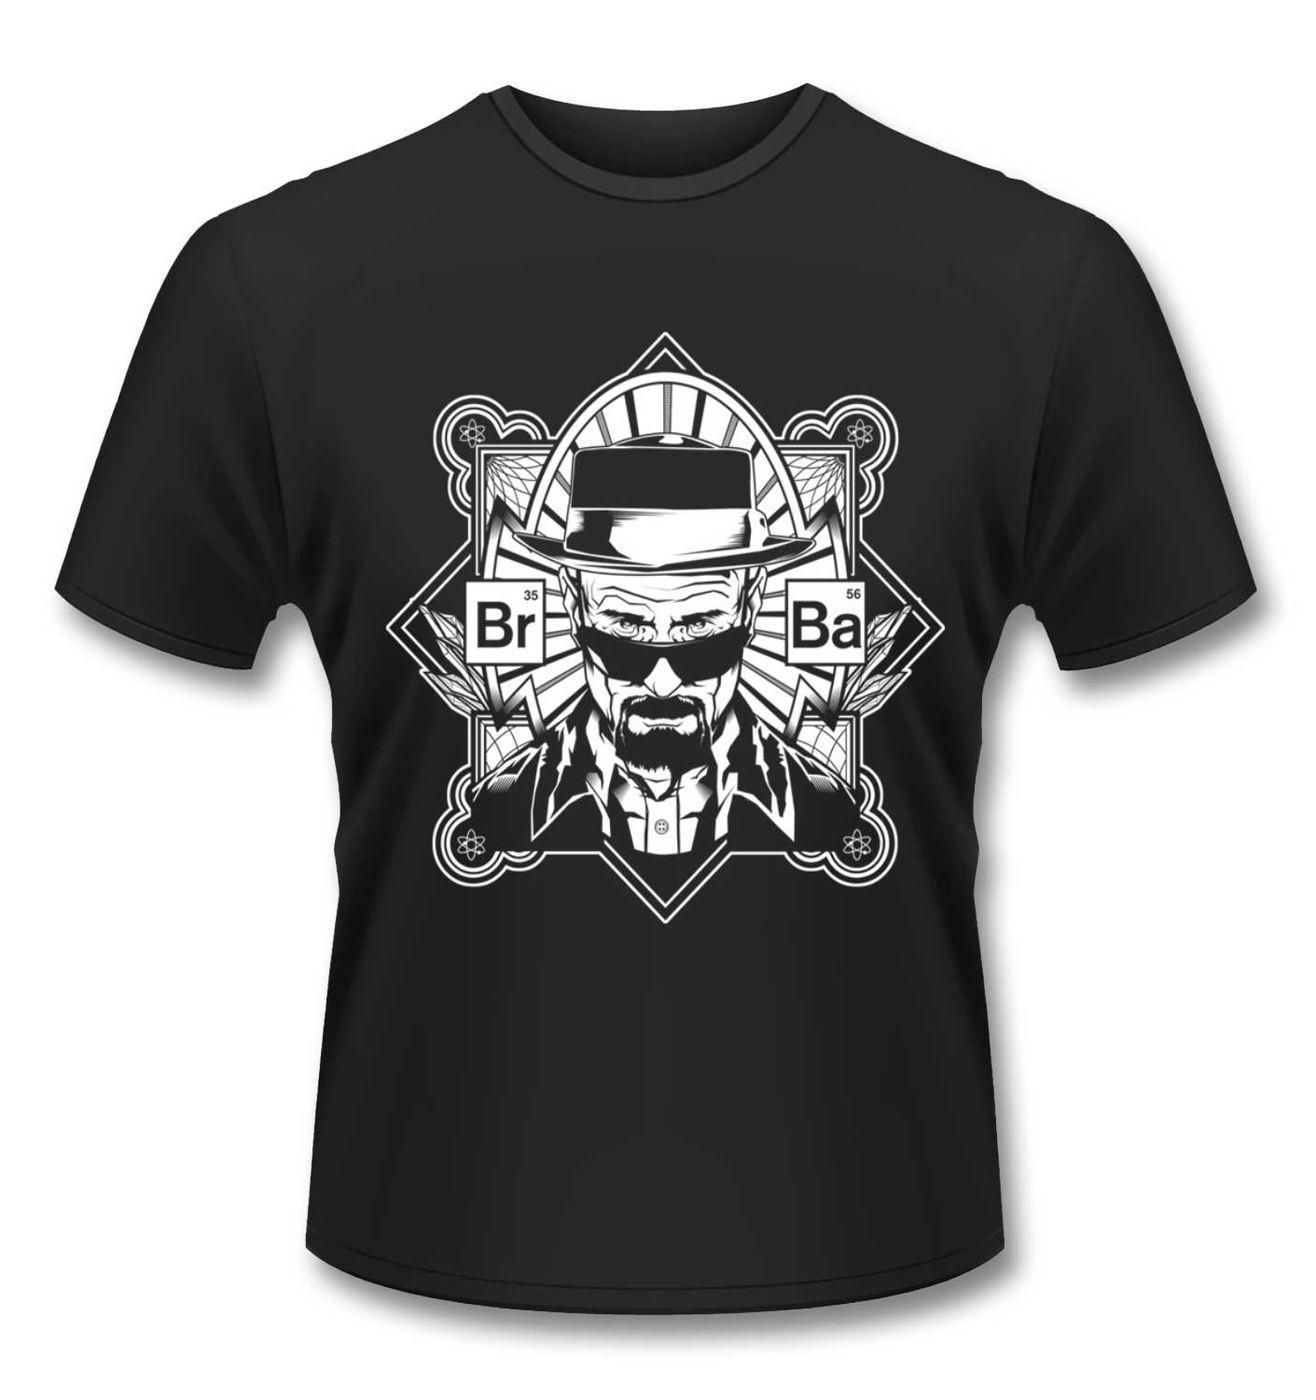 Official Breaking Bad Heisenberg Card t-shirt